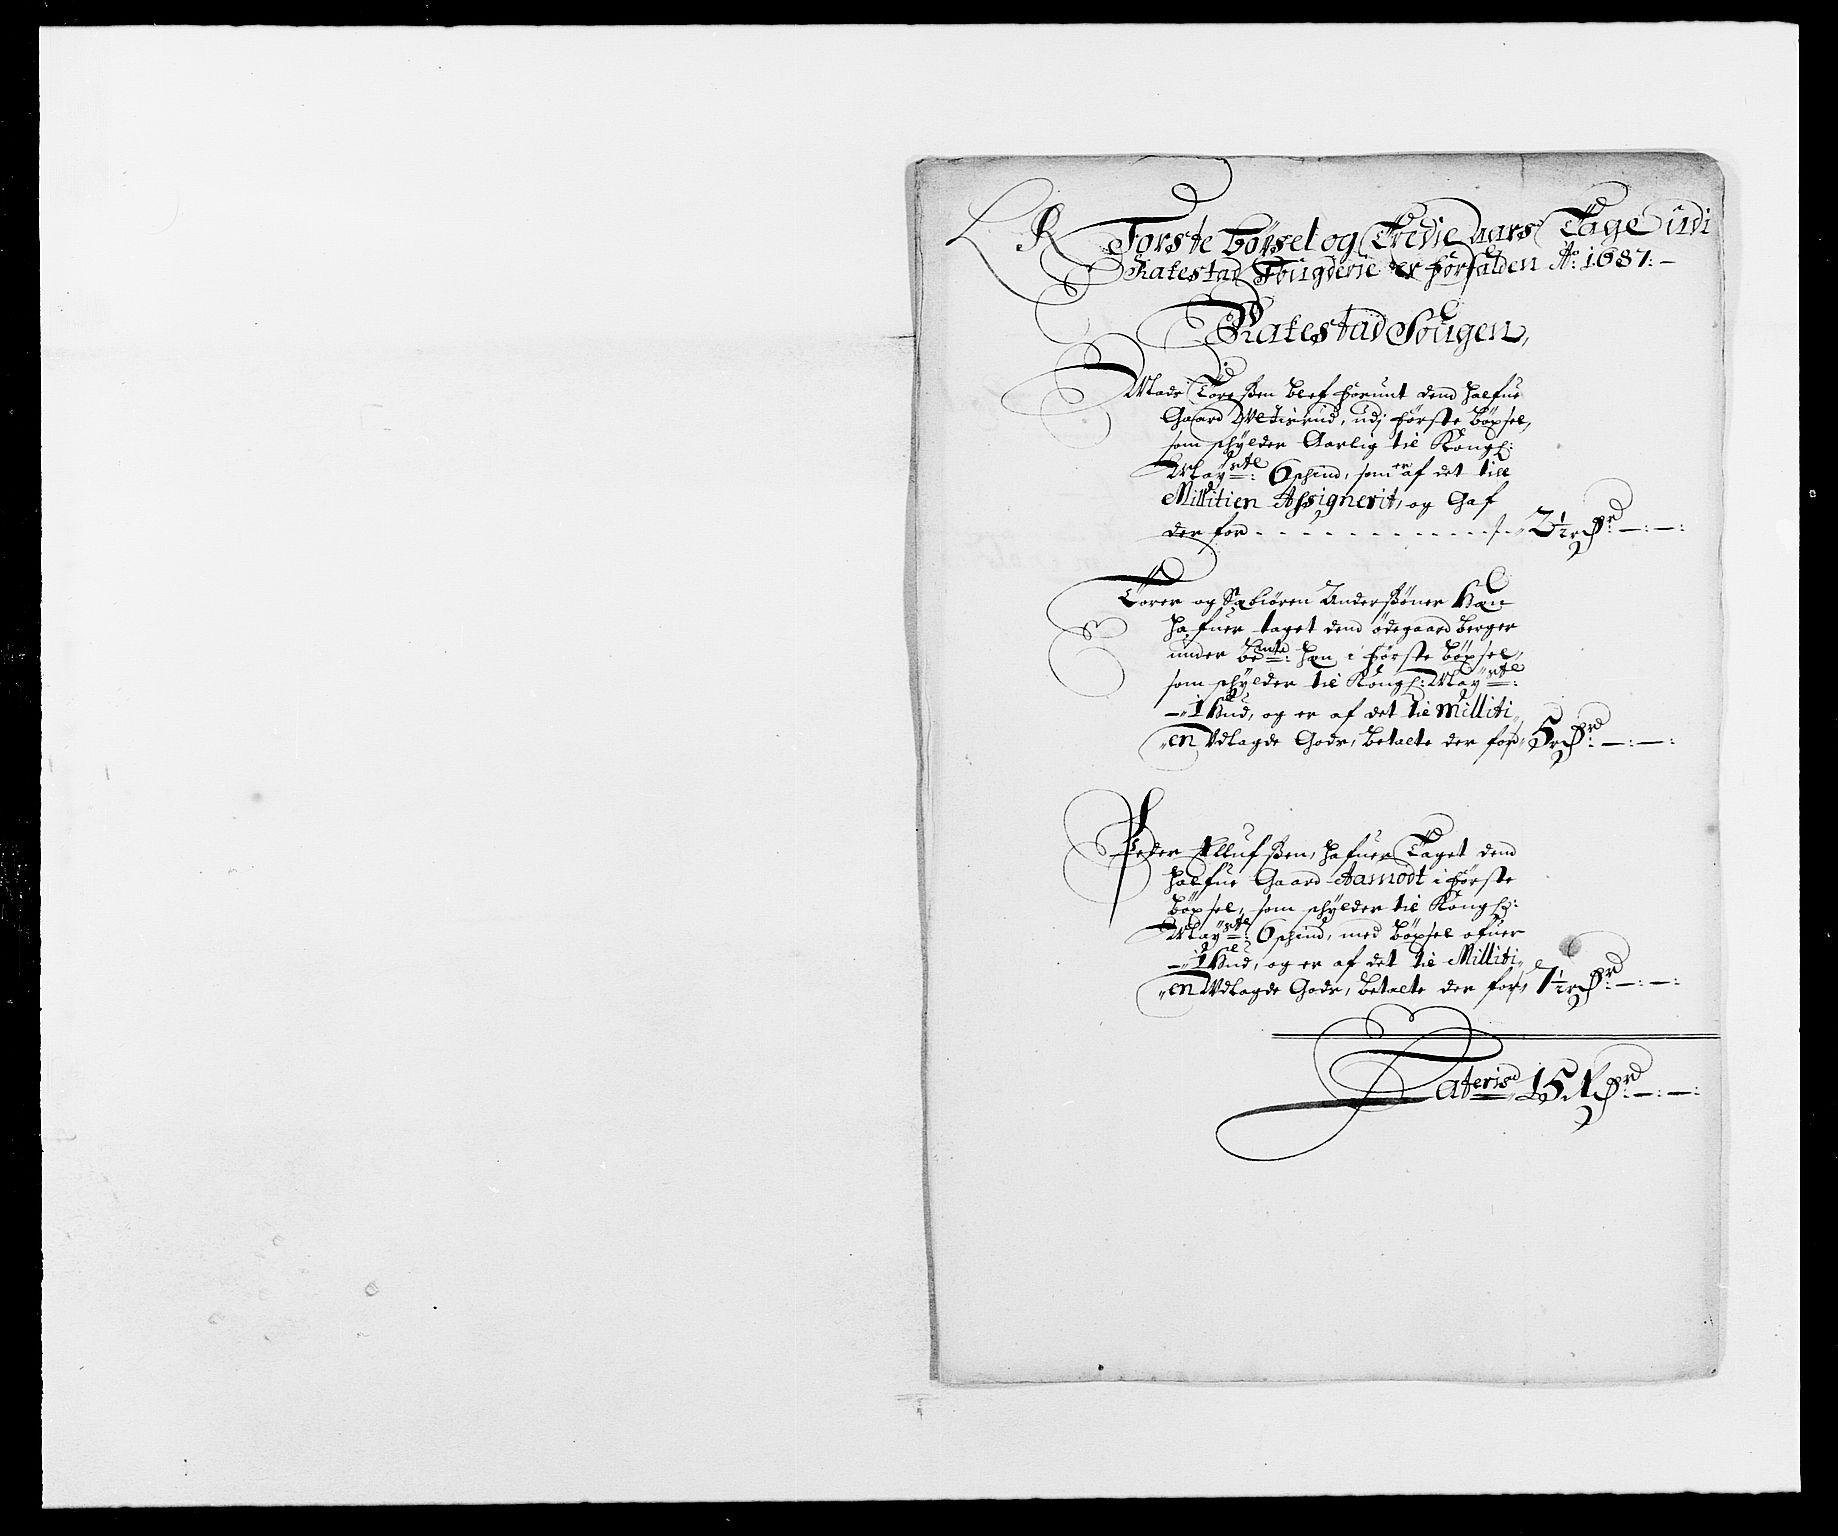 RA, Rentekammeret inntil 1814, Reviderte regnskaper, Fogderegnskap, R05/L0276: Fogderegnskap Rakkestad, 1683-1688, s. 6